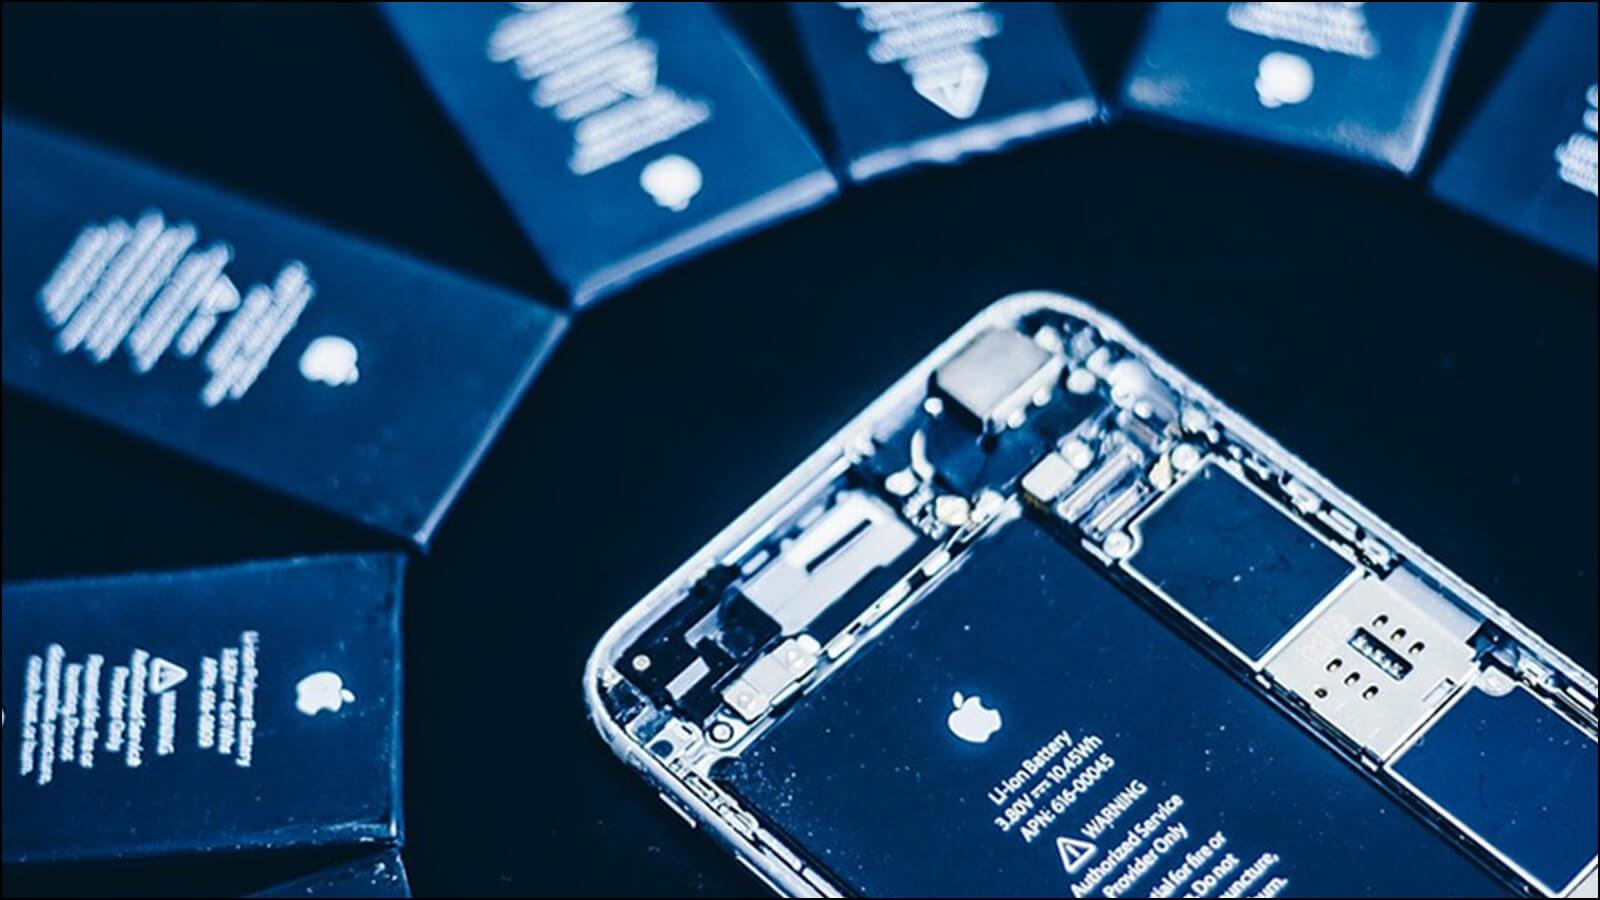 iPhoneバッテリー|早めに交換して新品時の性能を取り戻す